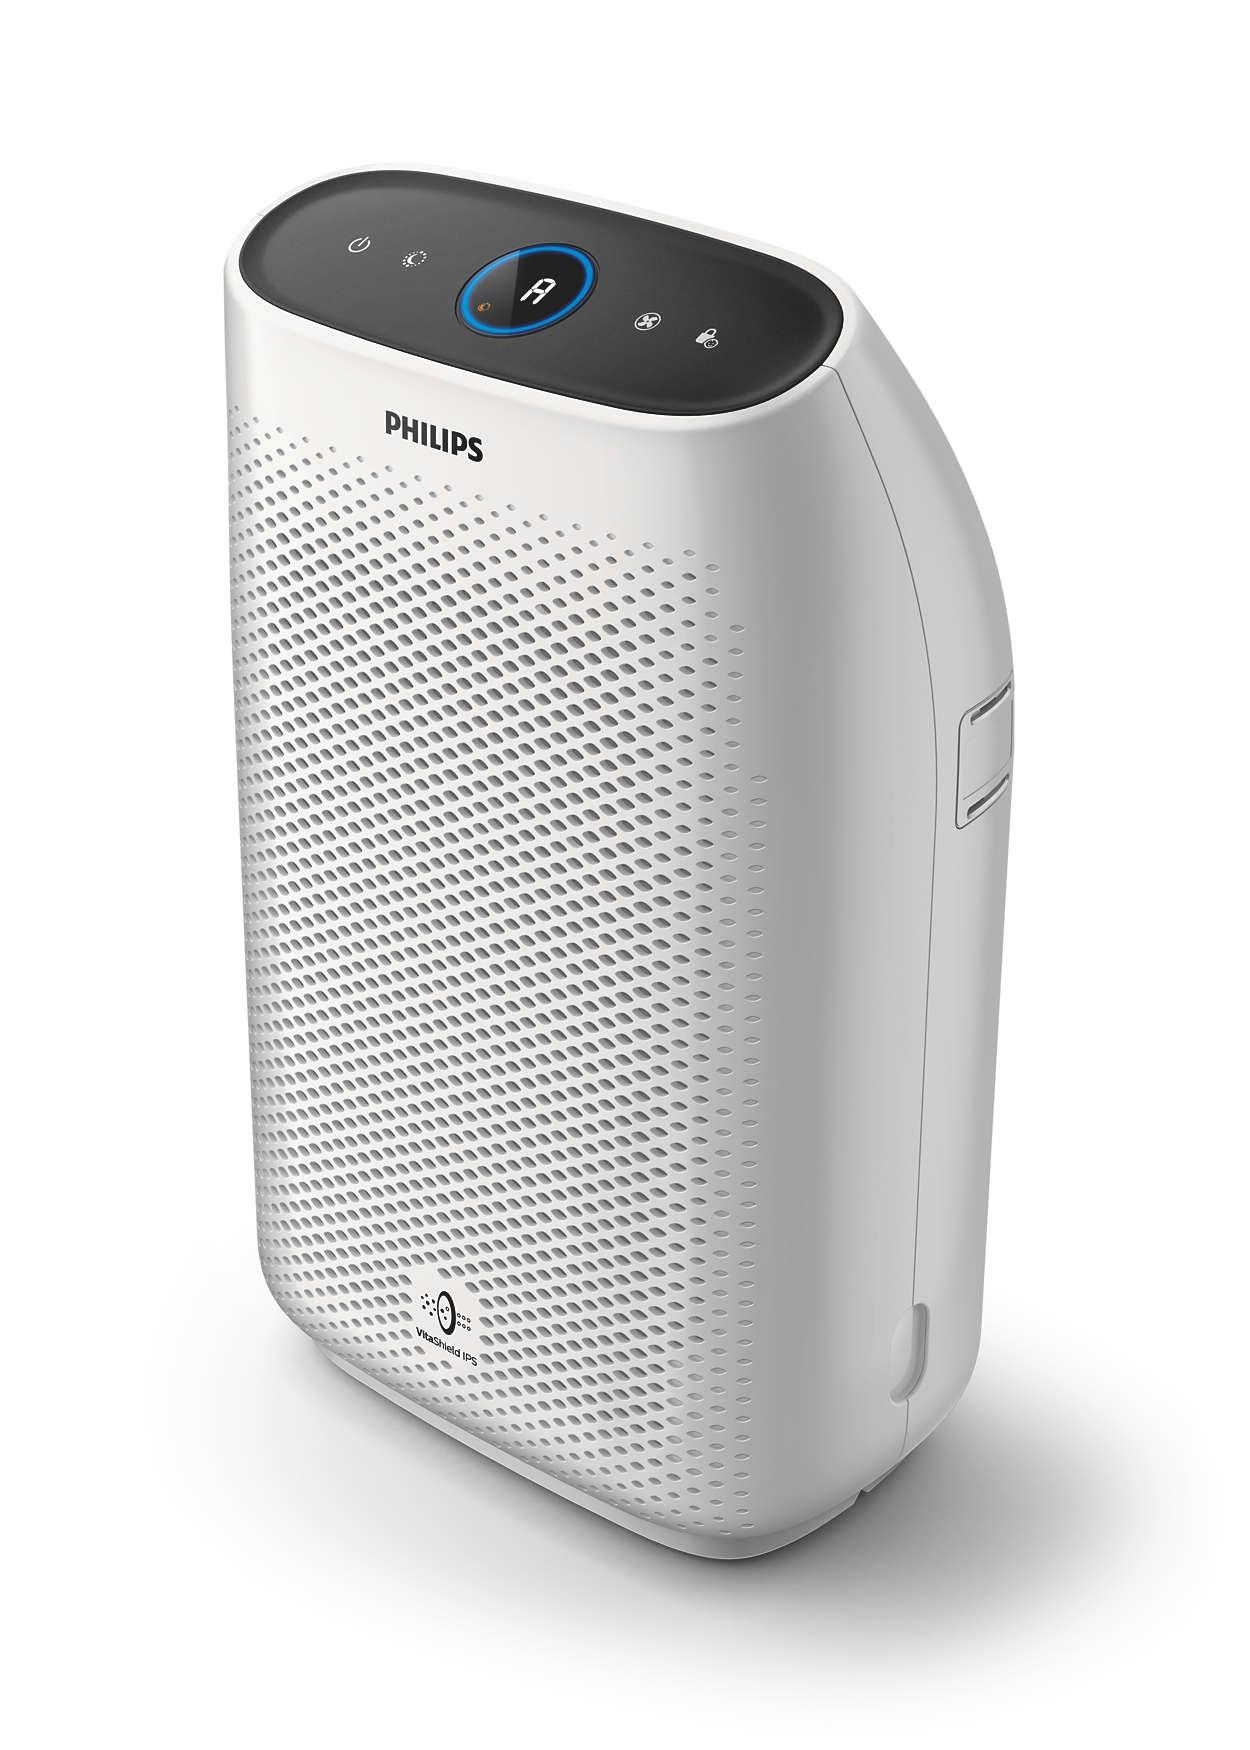 Purifies the air in less than 12 mins (1)